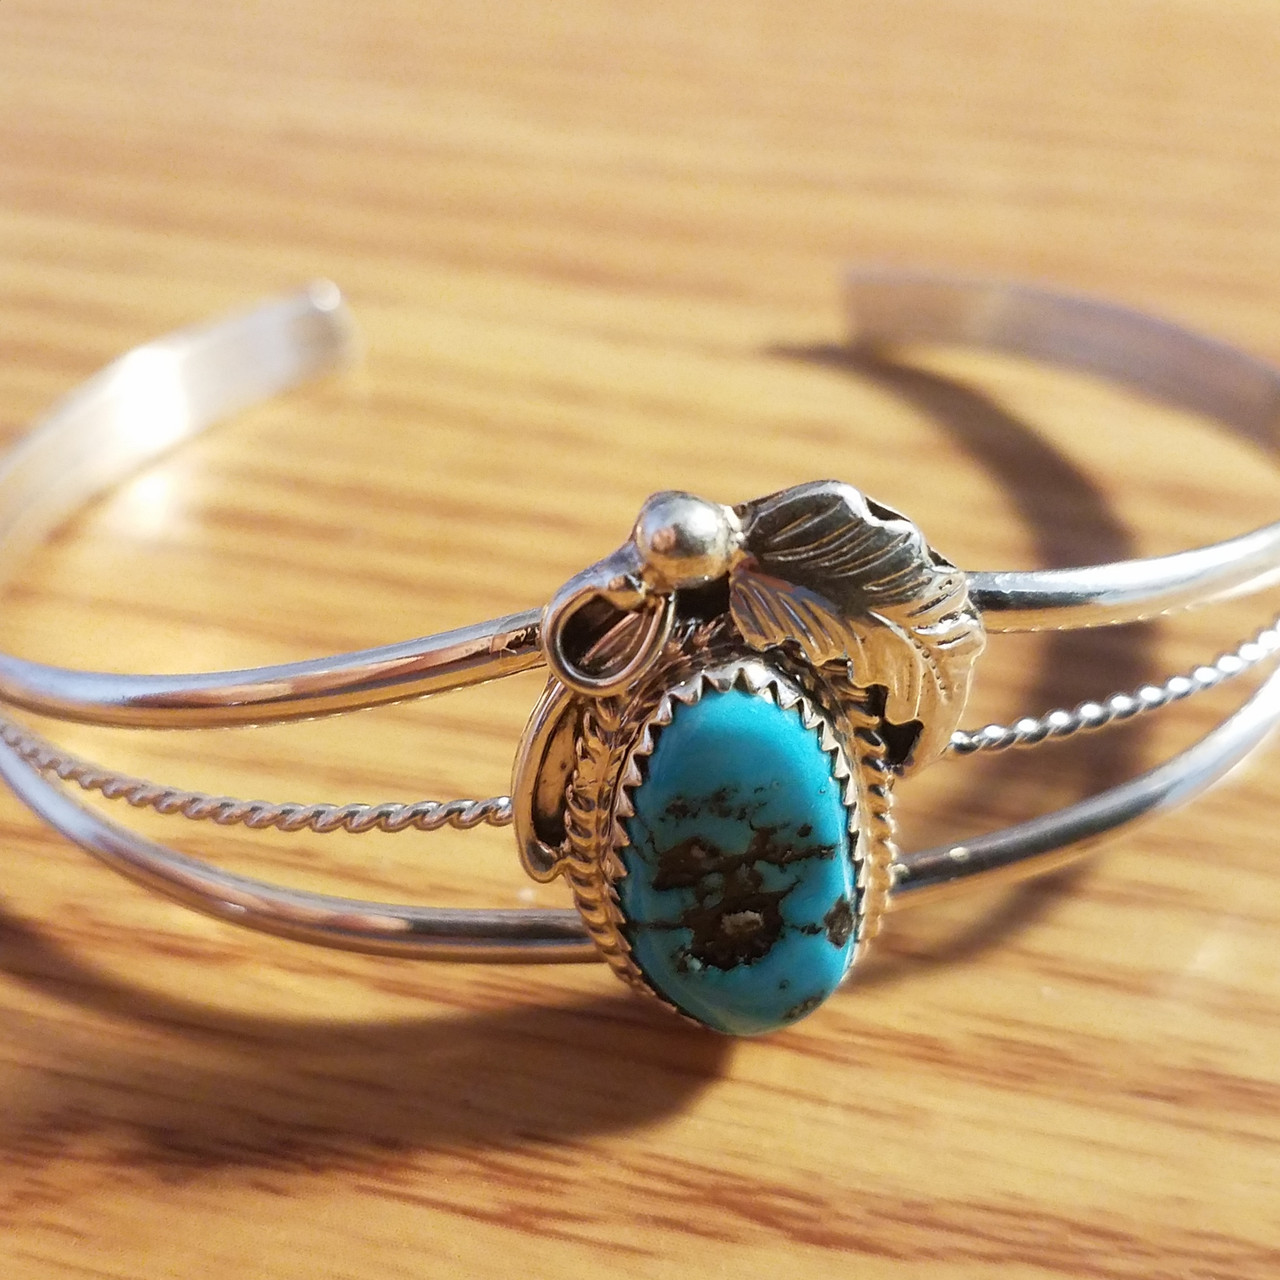 Sterling Silver Native American Southwestern Native American Turquoise Cuff Bracelet